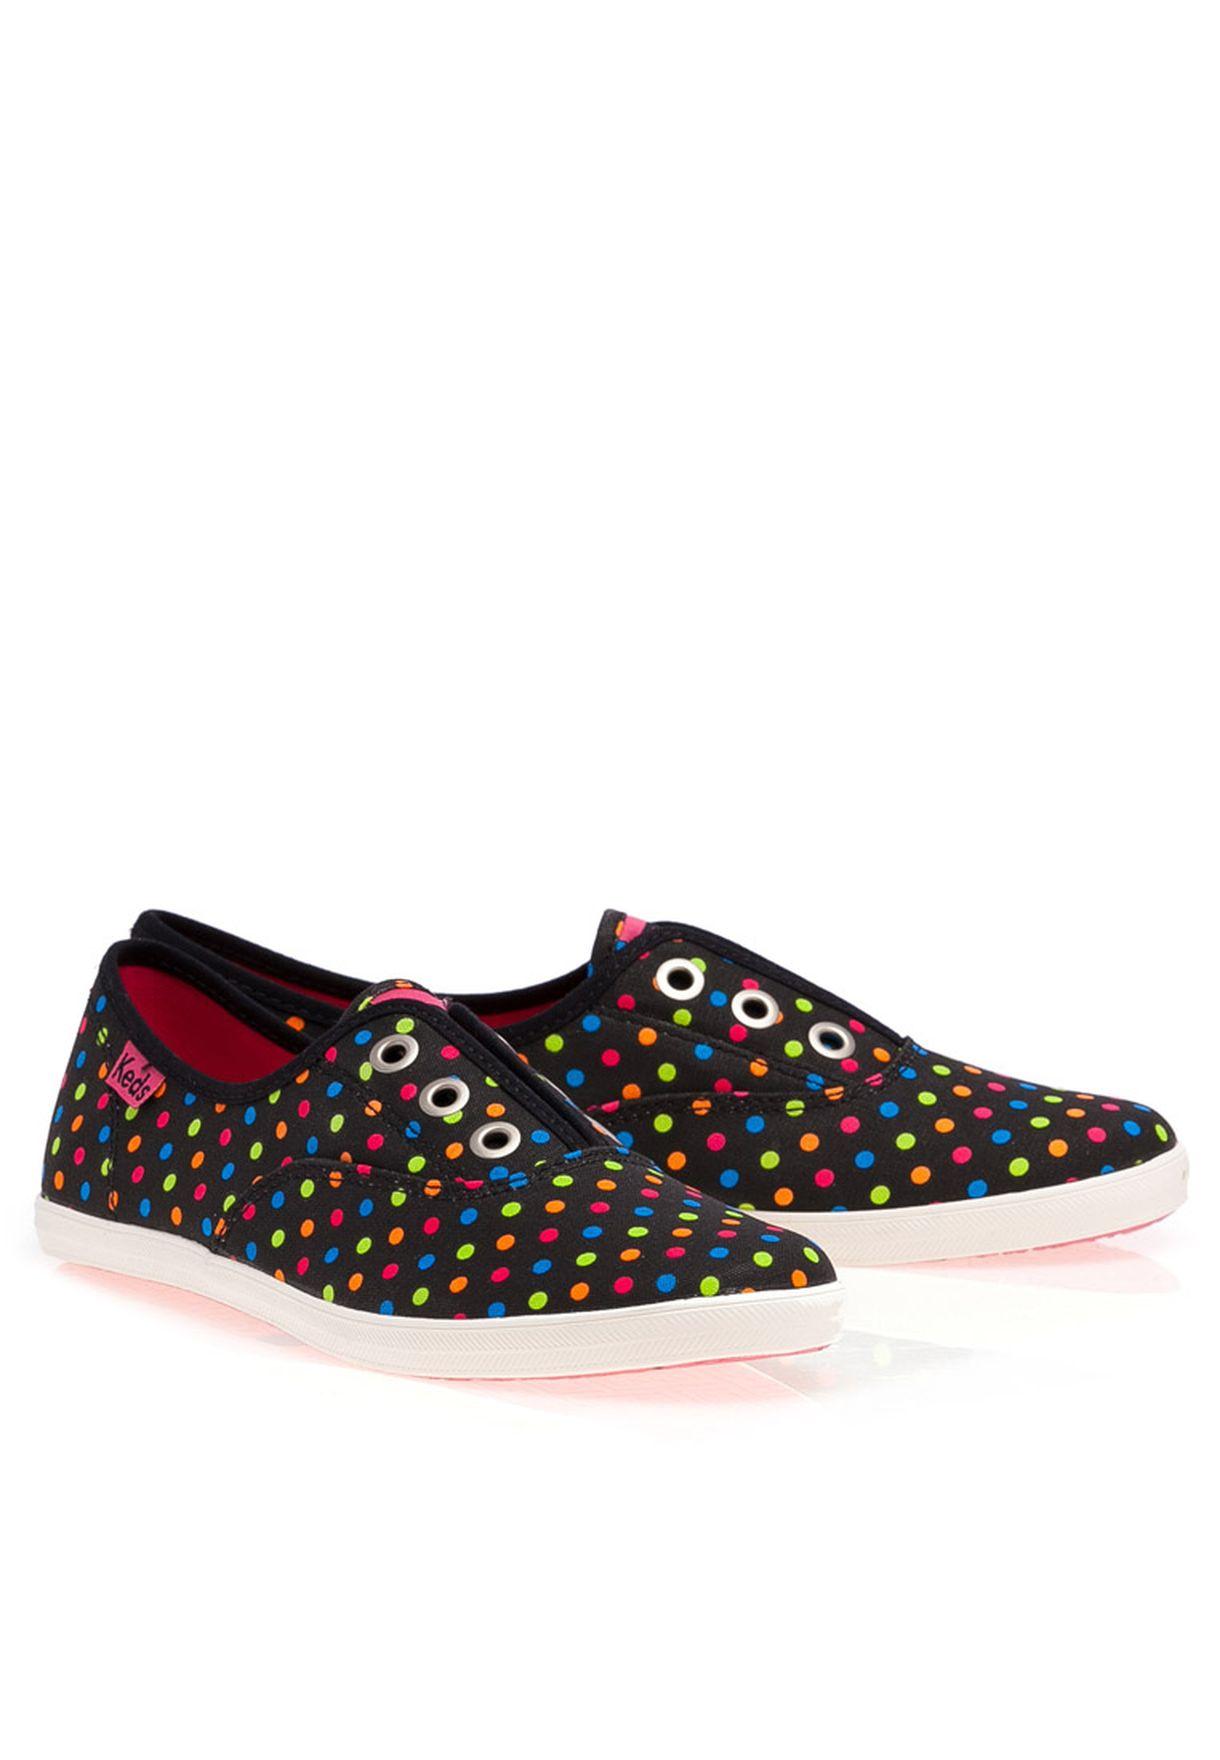 a6174e2f20439 Rookie Laceless Sneaker